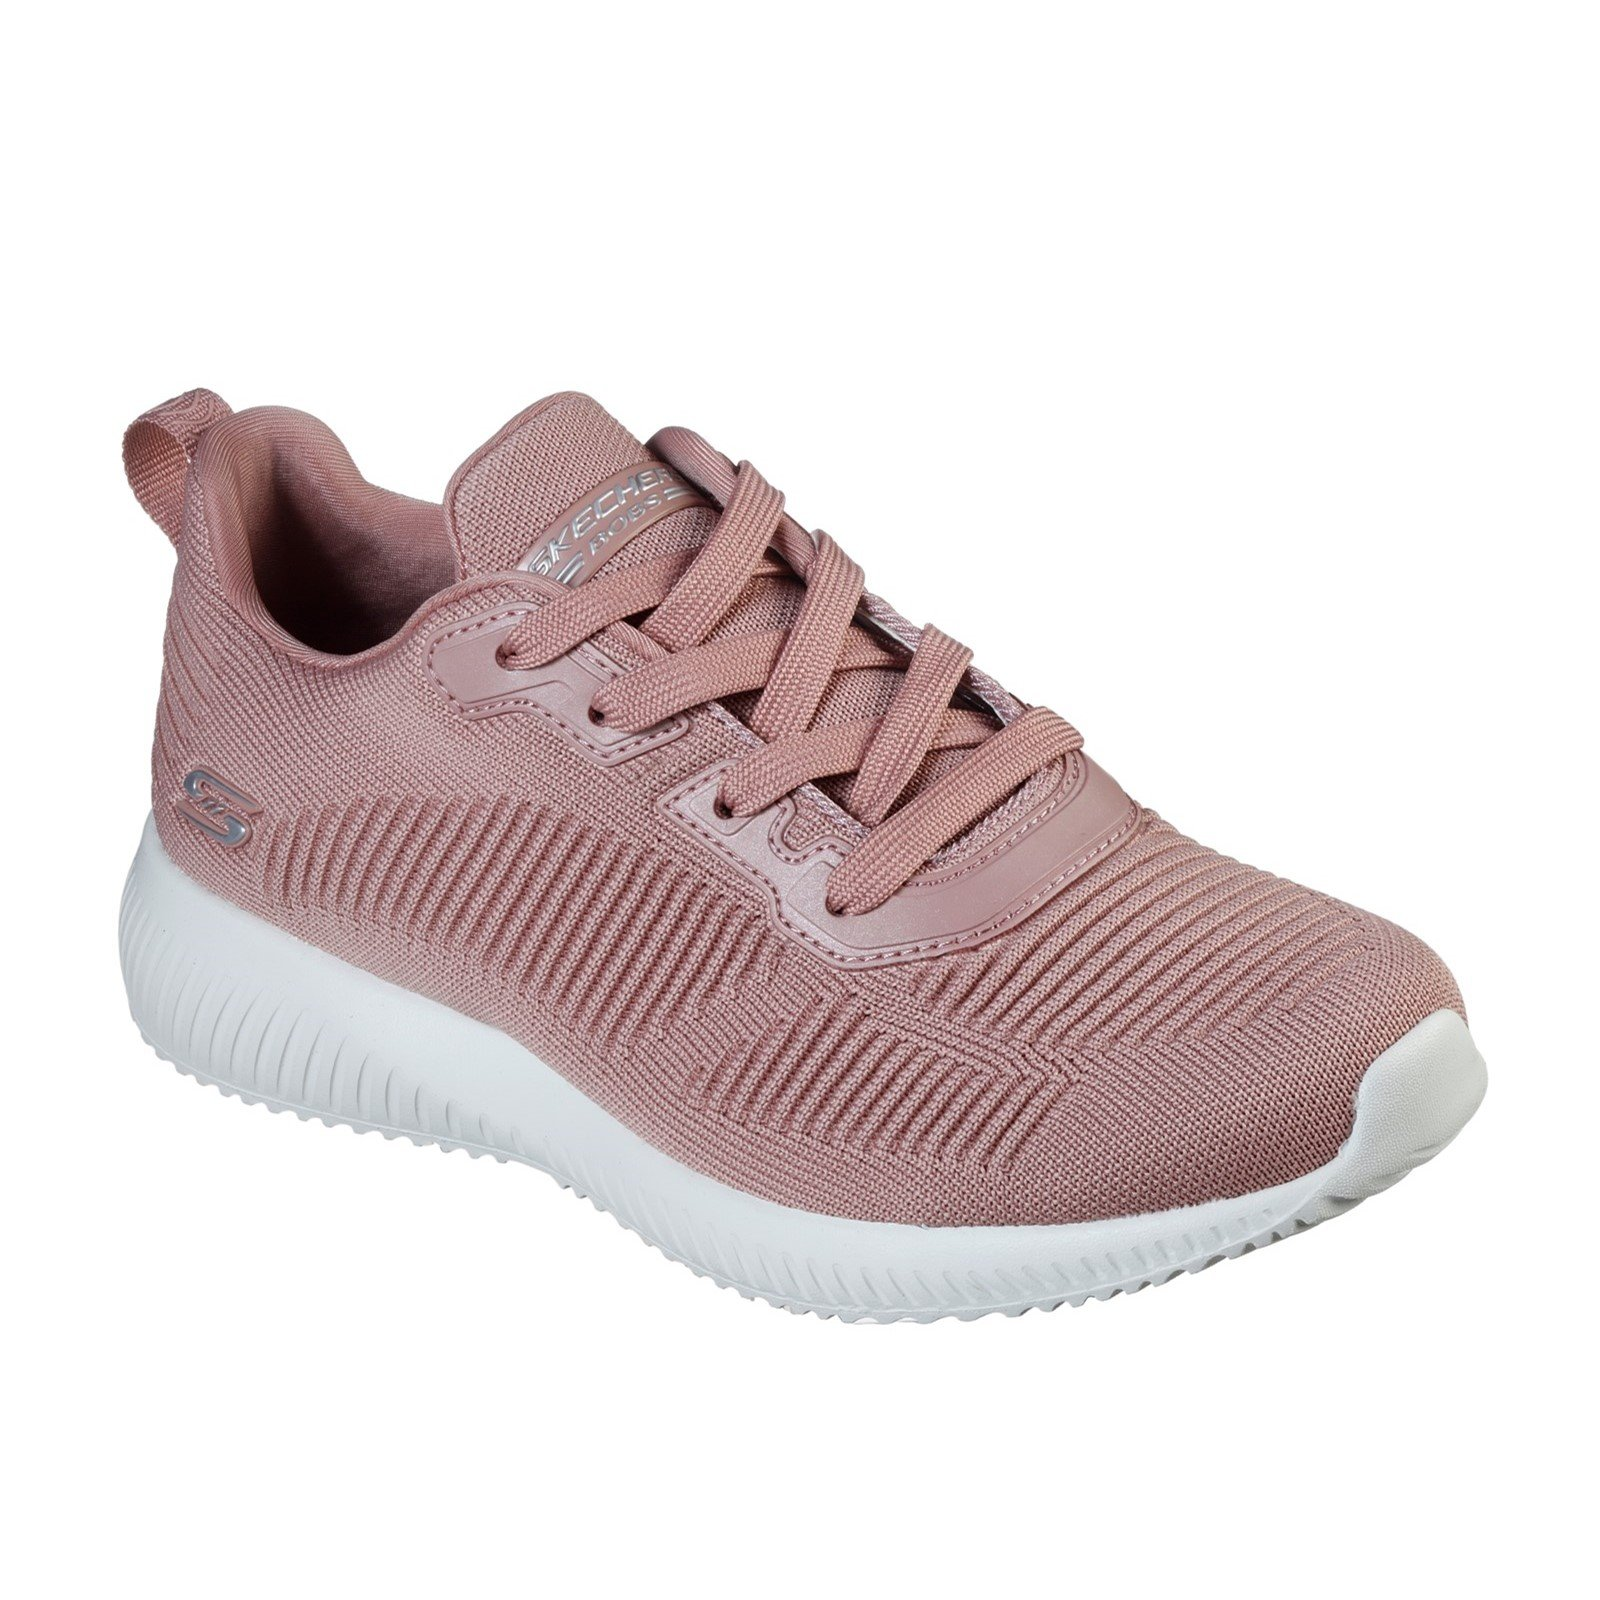 Skechers Women's Bobs Squad Tough Talk Wide Trainer Various Colours 33062 - Pink 5